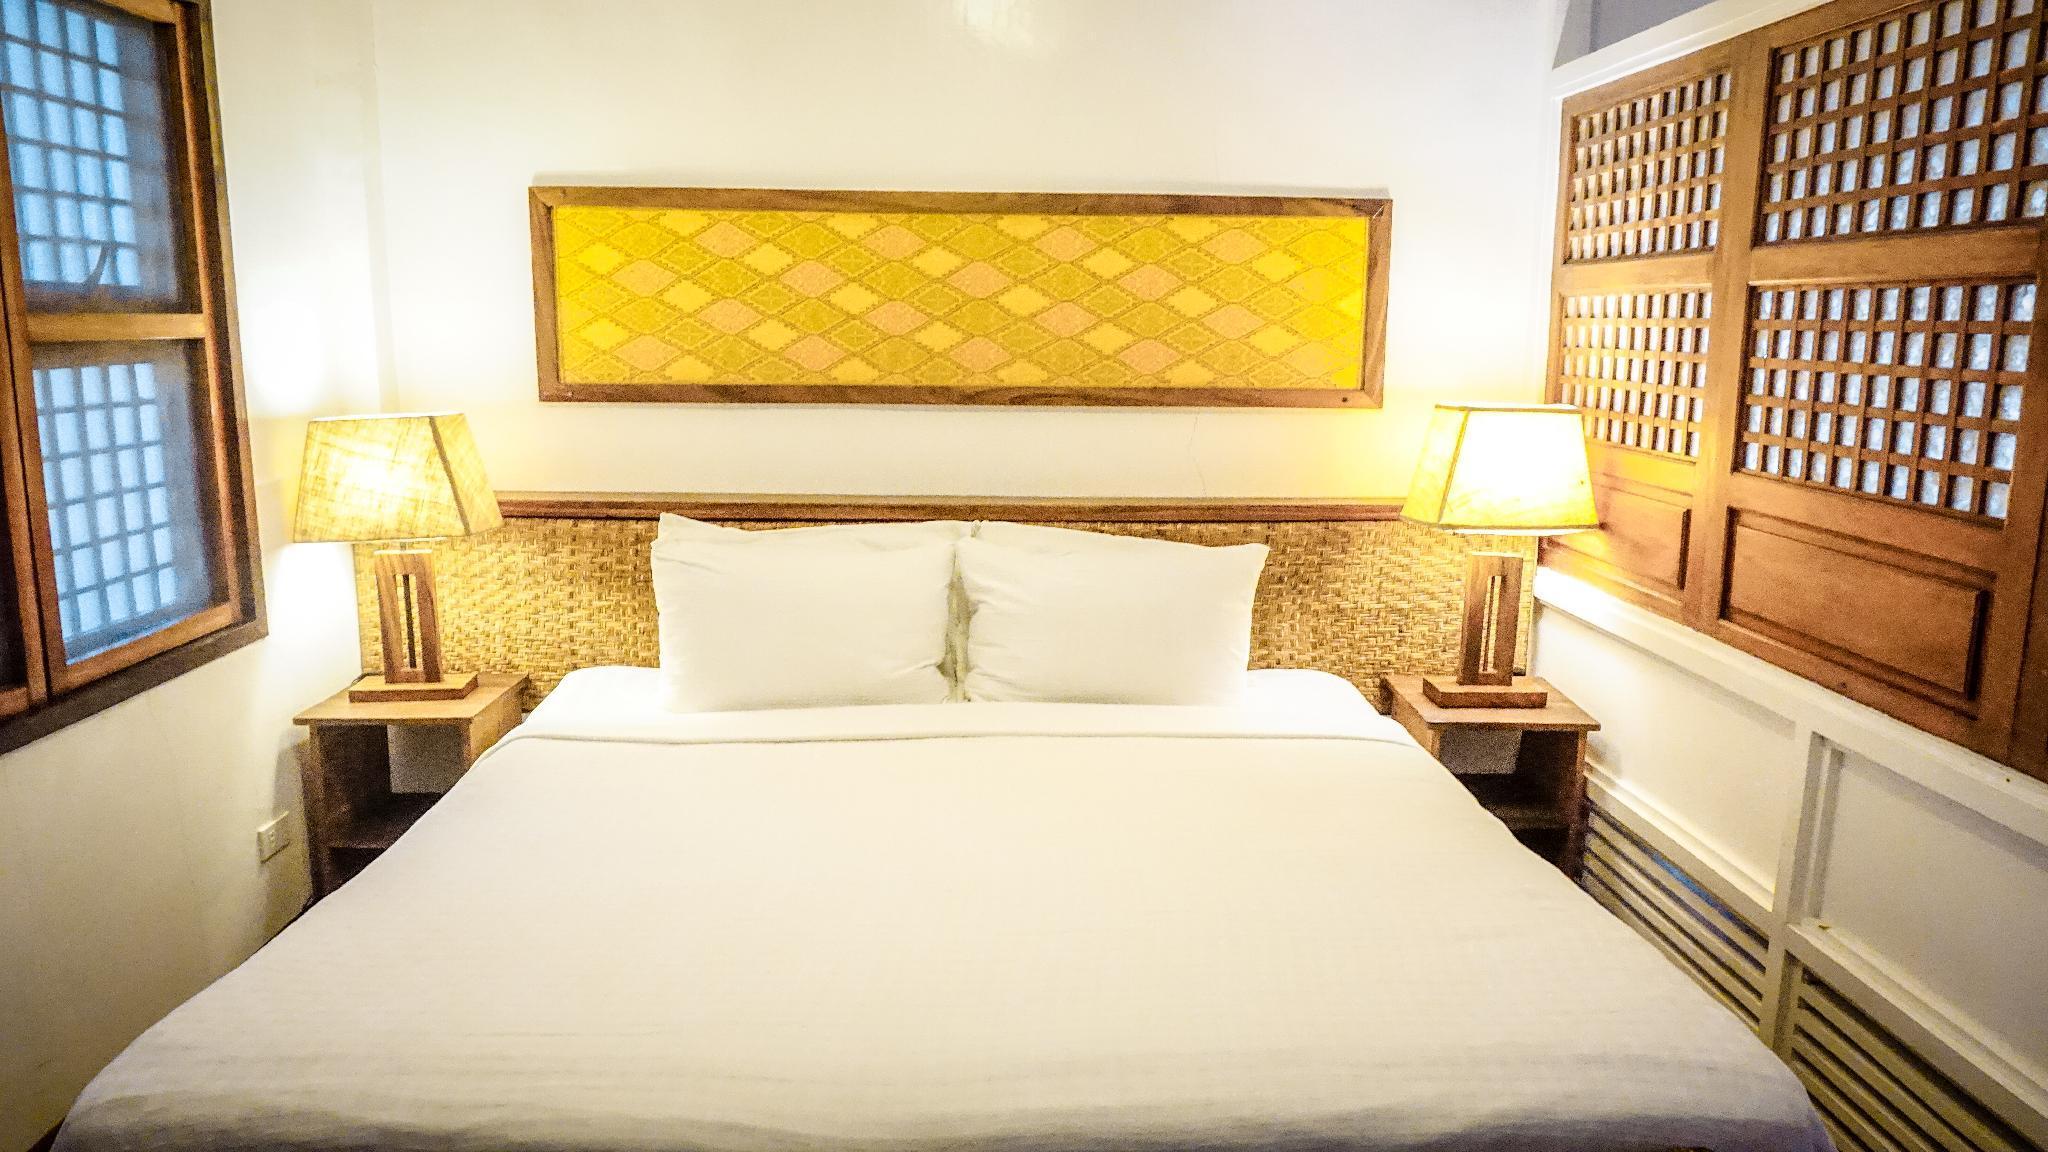 COCOTEL Vista Del Mar Resort, Zamboanga City